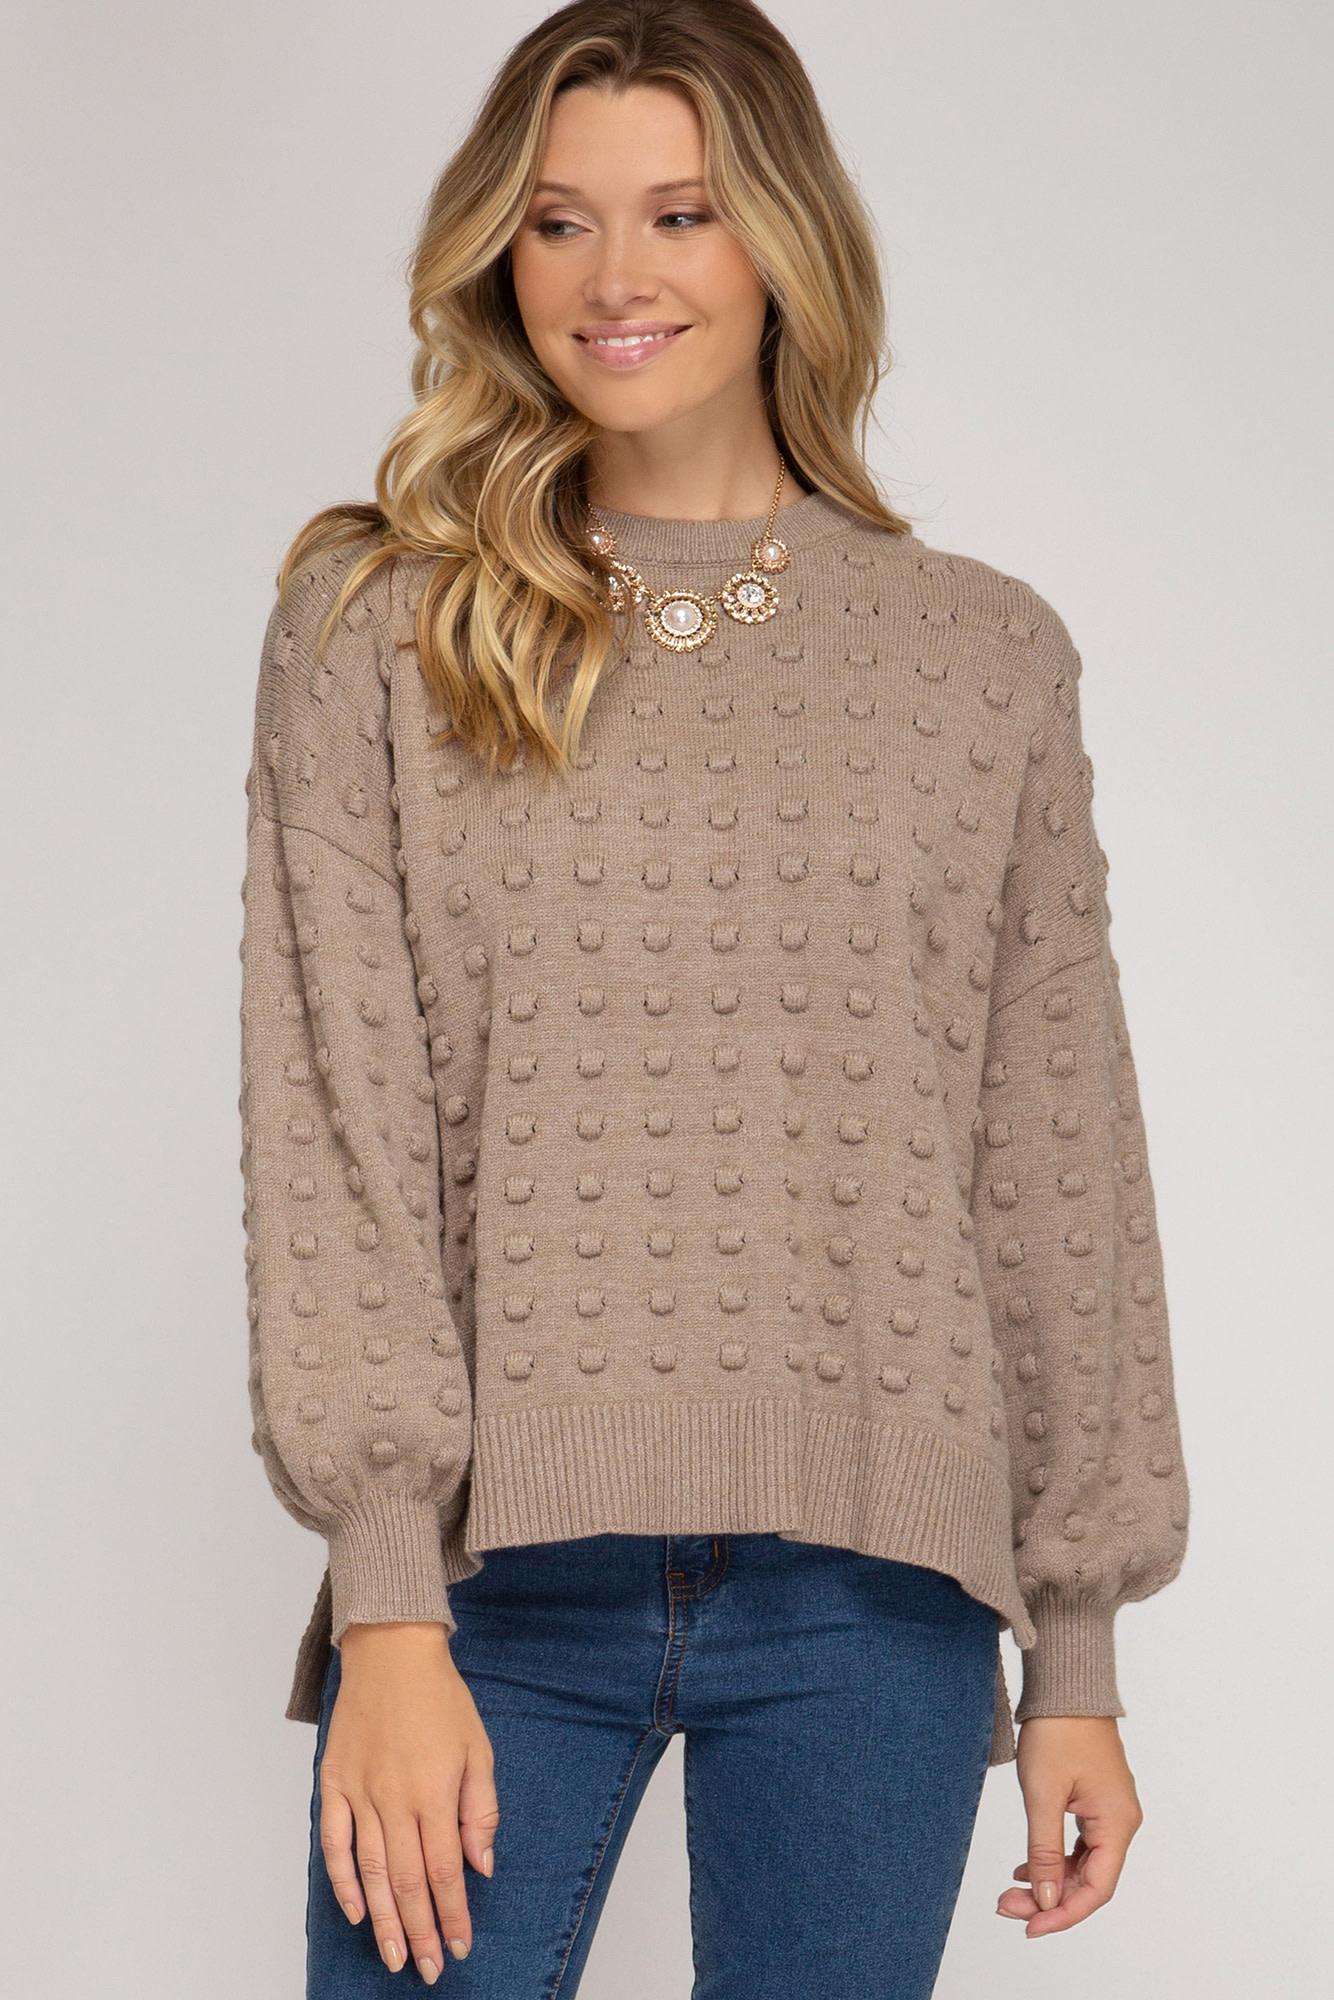 She + Sky Long Balloon Sleeve Textured Knit Sweater